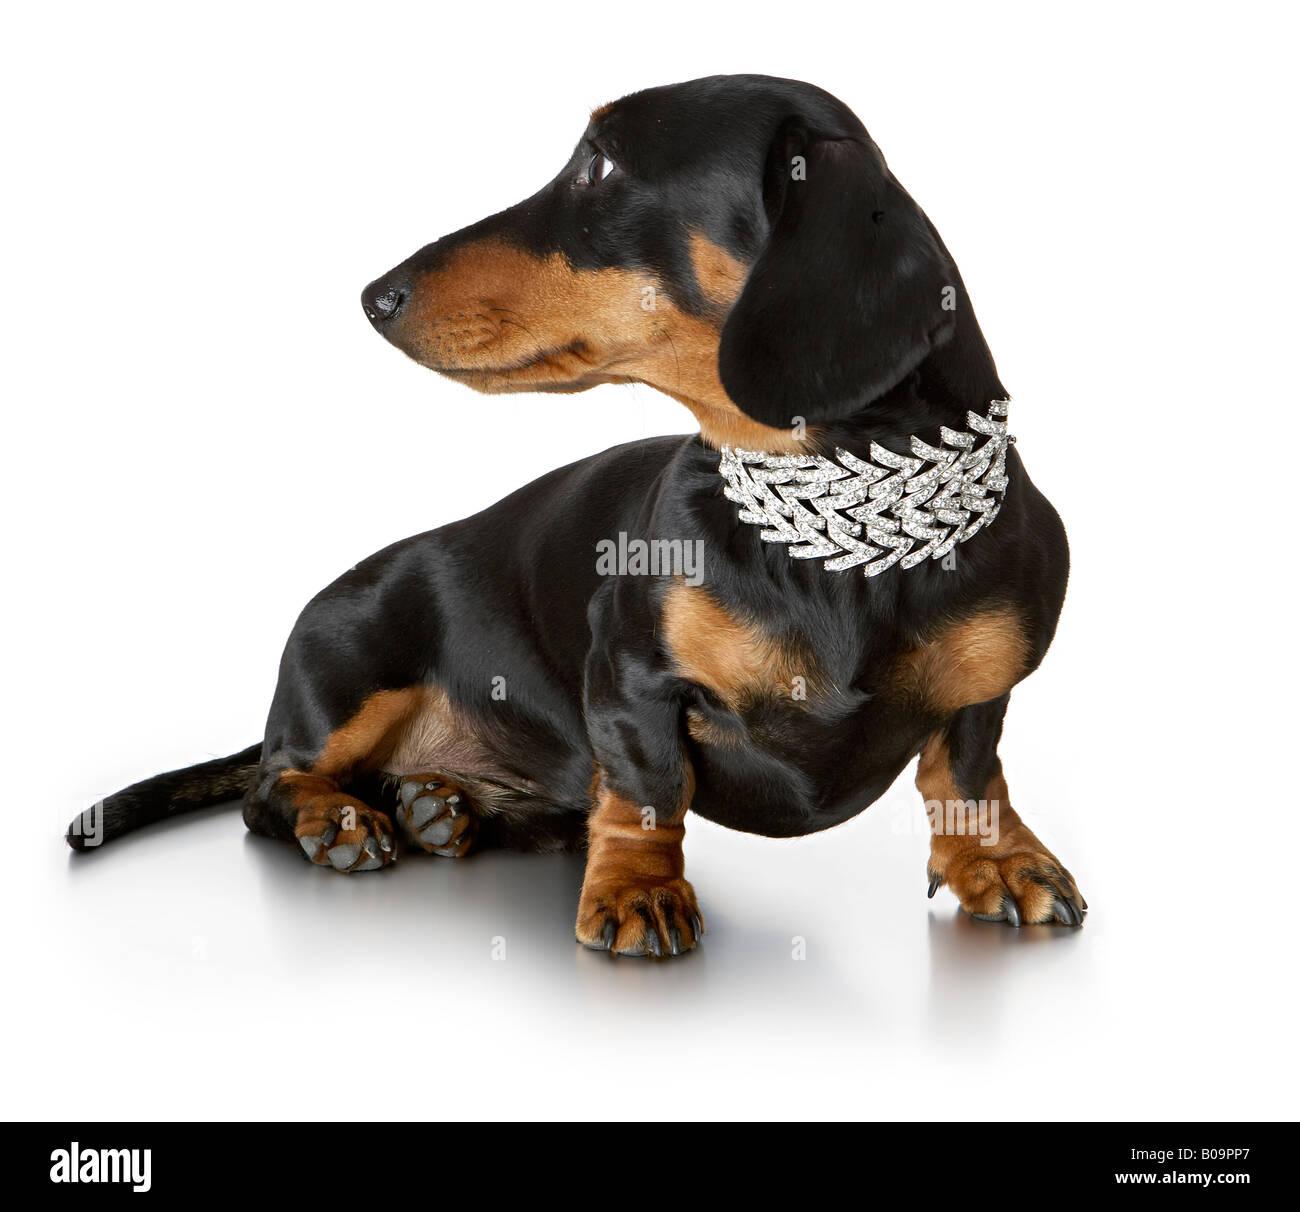 daschund in diamond collar - Stock Image